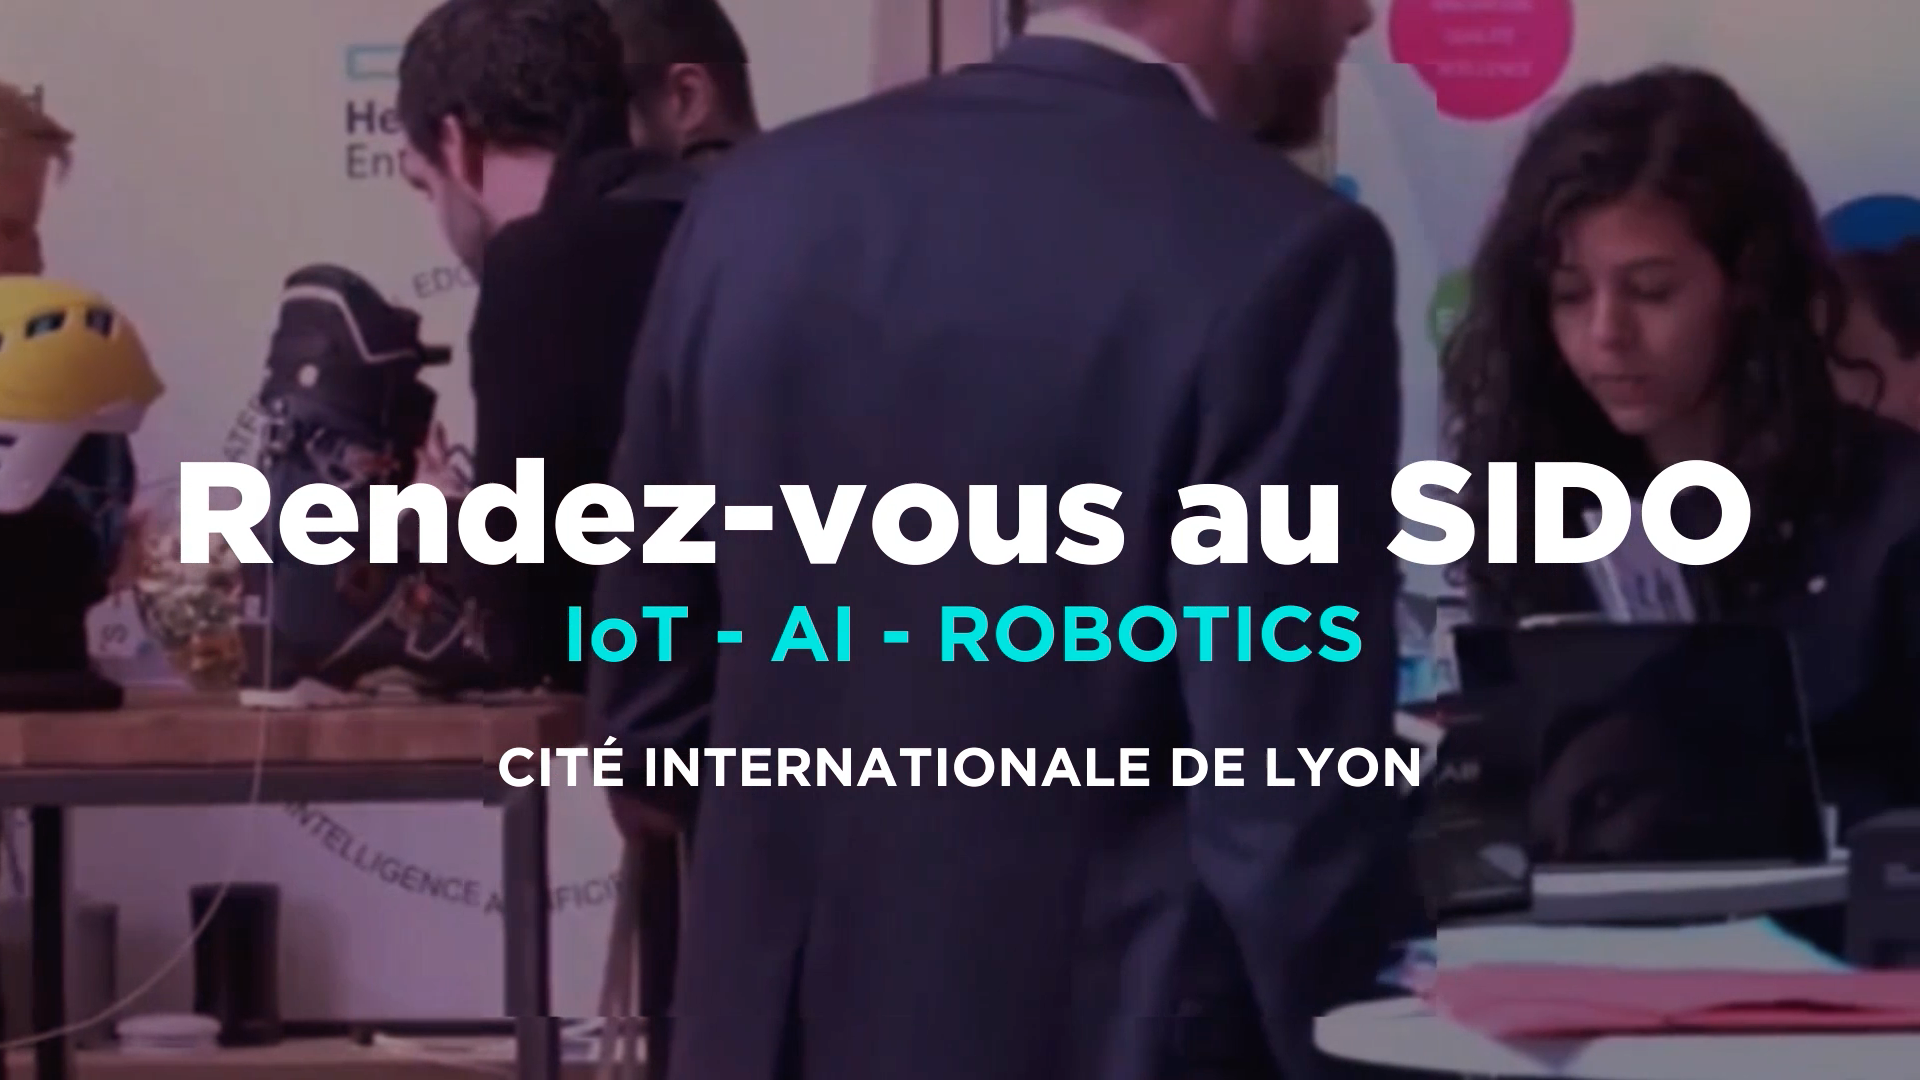 SIDO IOT AI ROBOTICS